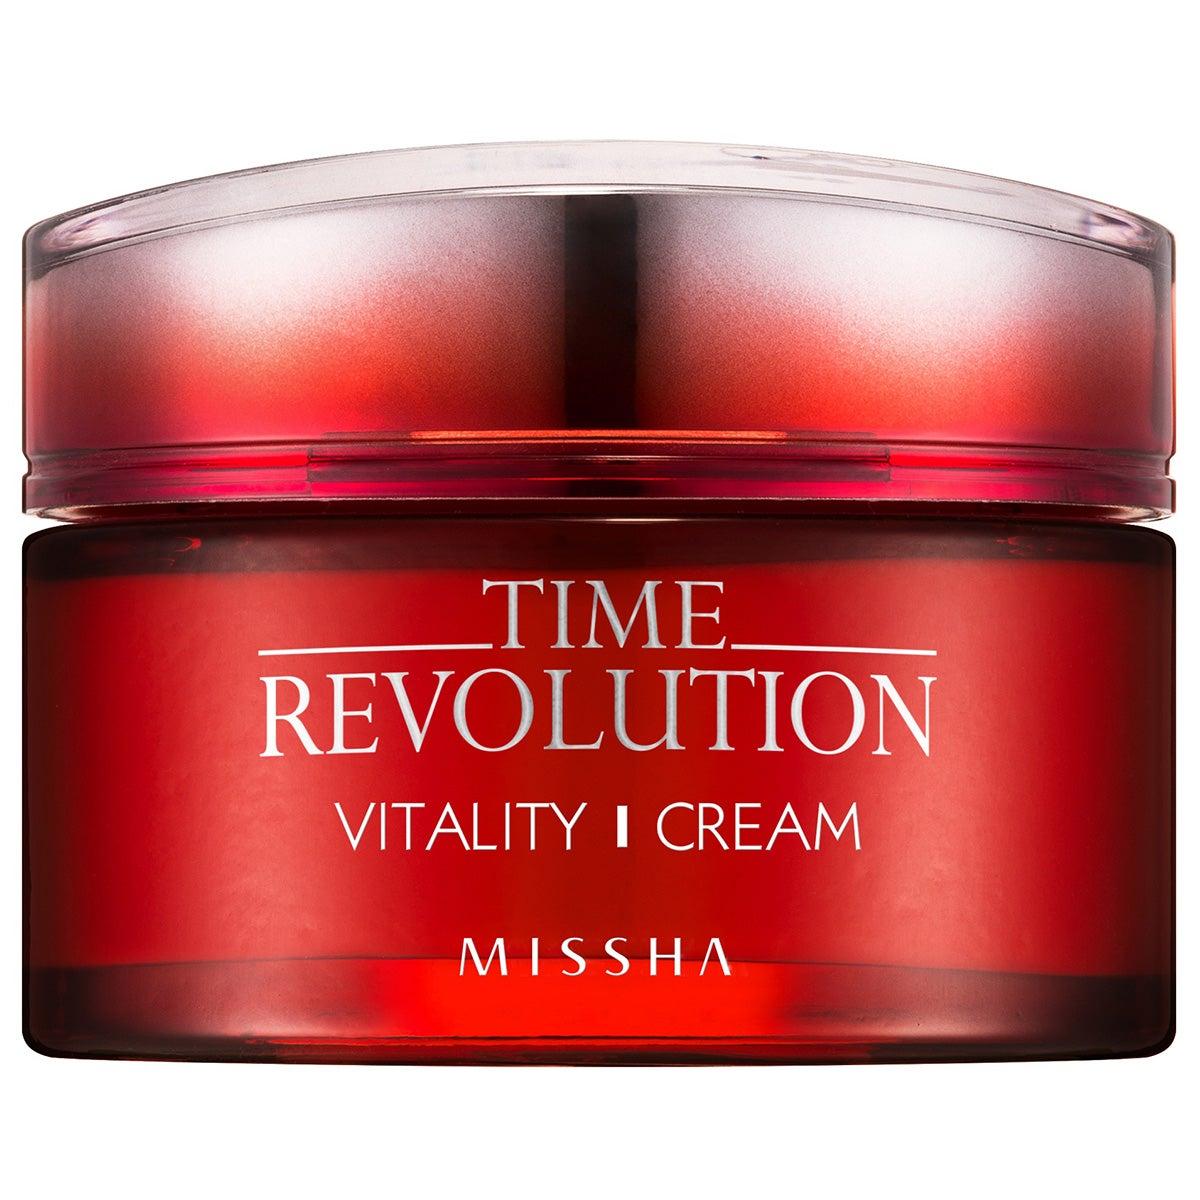 Time Revolution Vitality Cream, 50 ml MISSHA K Beauty Ansiktskräm